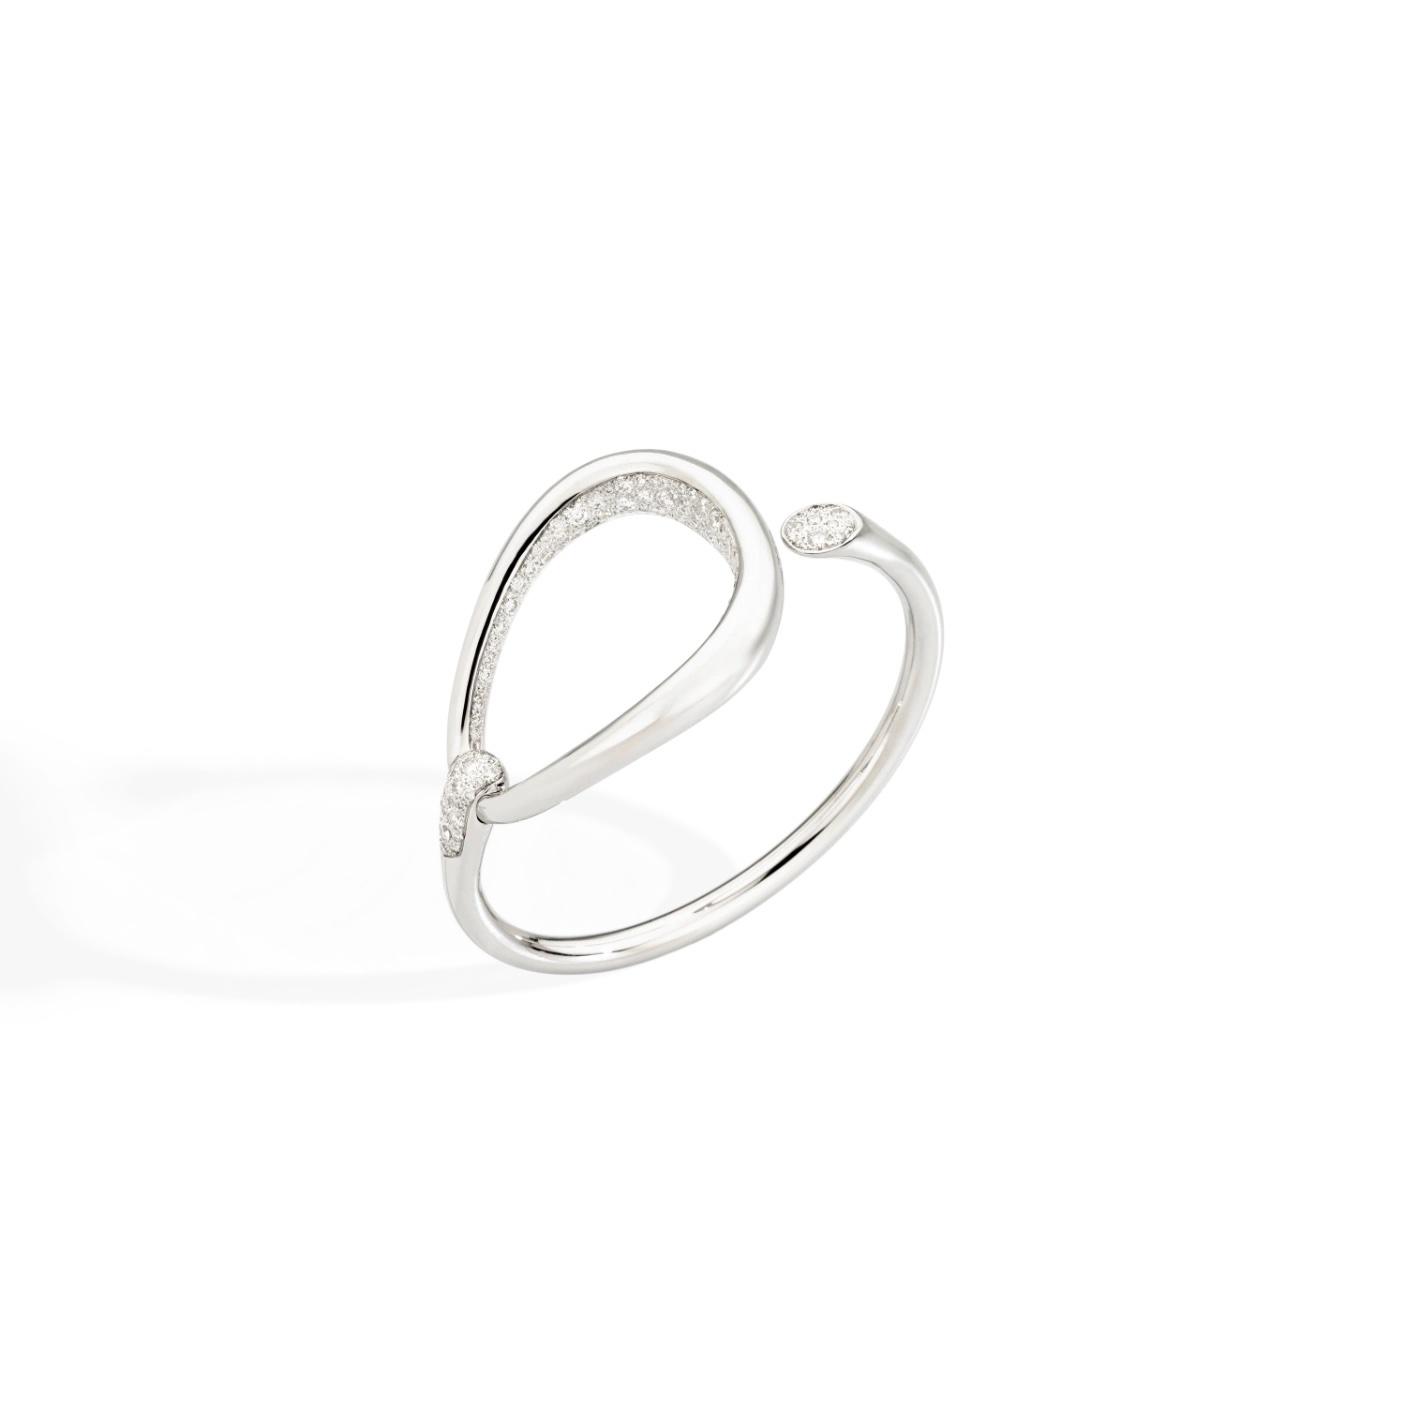 Pomellato Pomellato Fantina armband in 18 krt. witgoud met witte diamanten